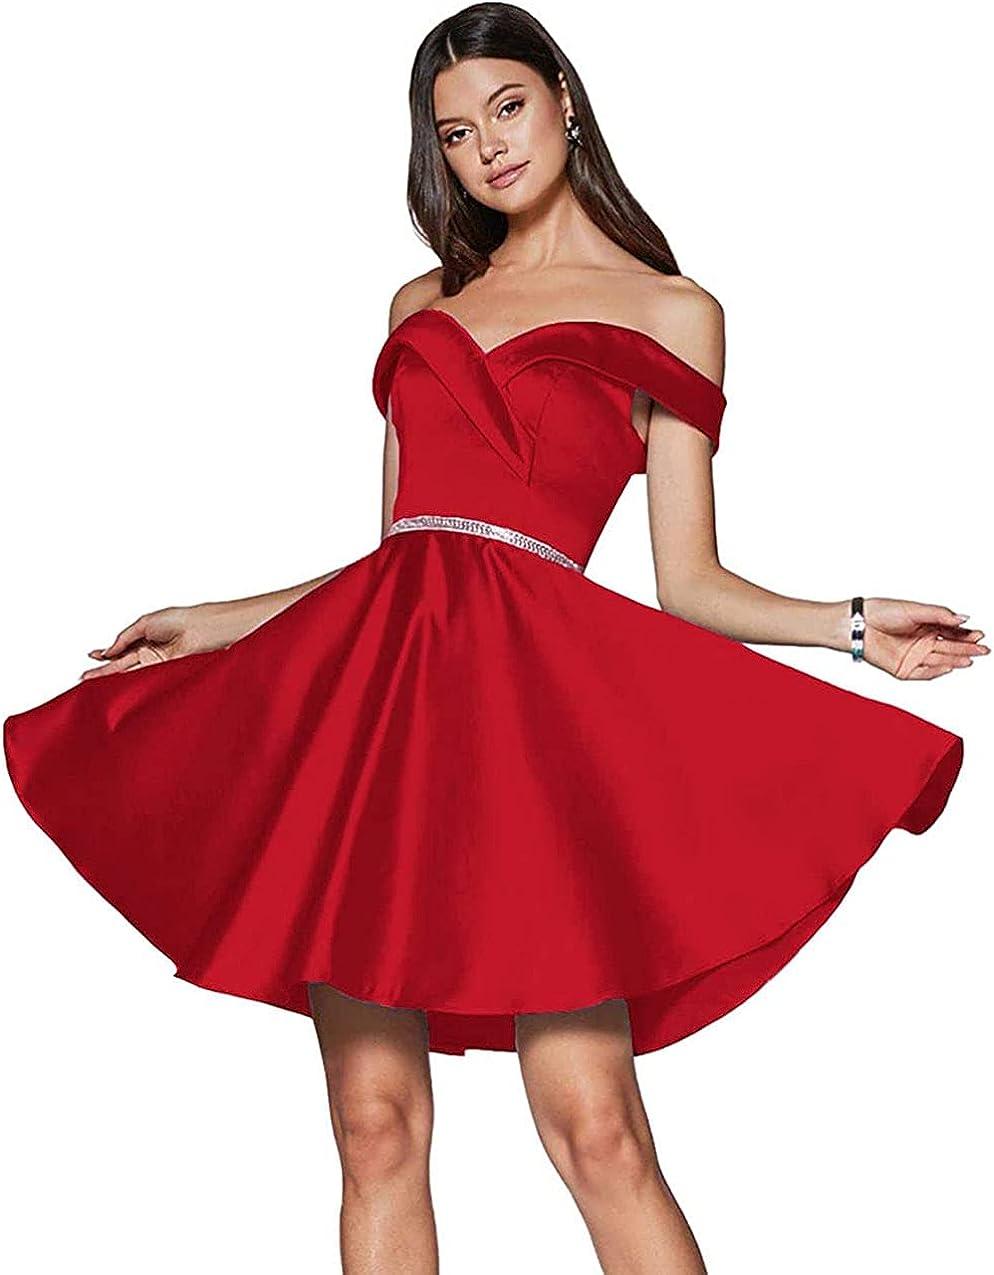 AKHOKA Women's Off Shoulder Satin Homecoming Dresses Short 2021 Beaded Party Dress with Pockets